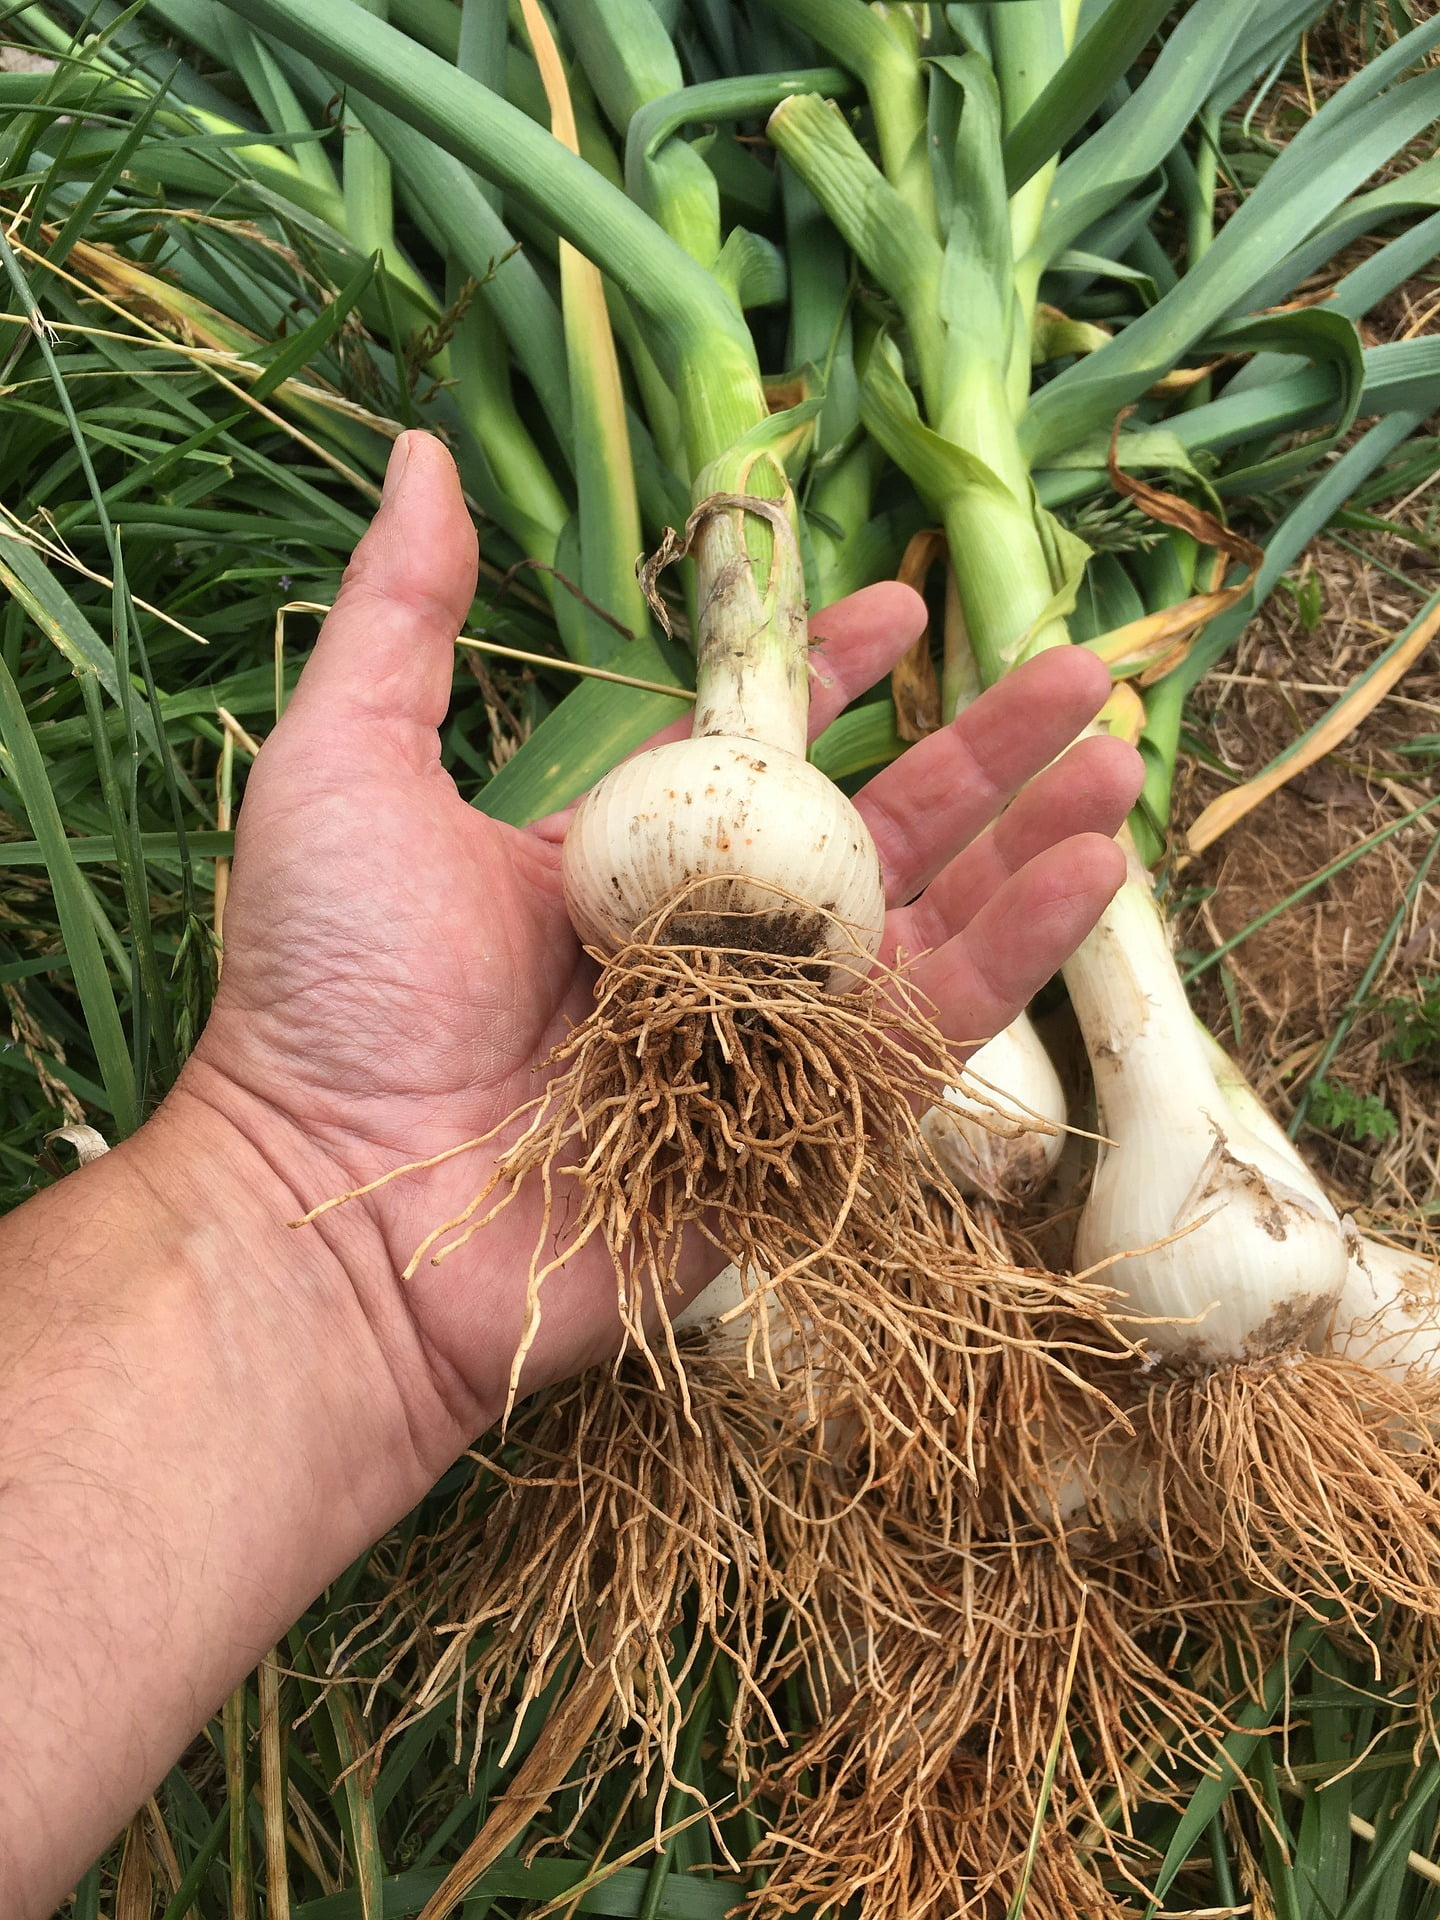 Hand holding harvested garlic bulb